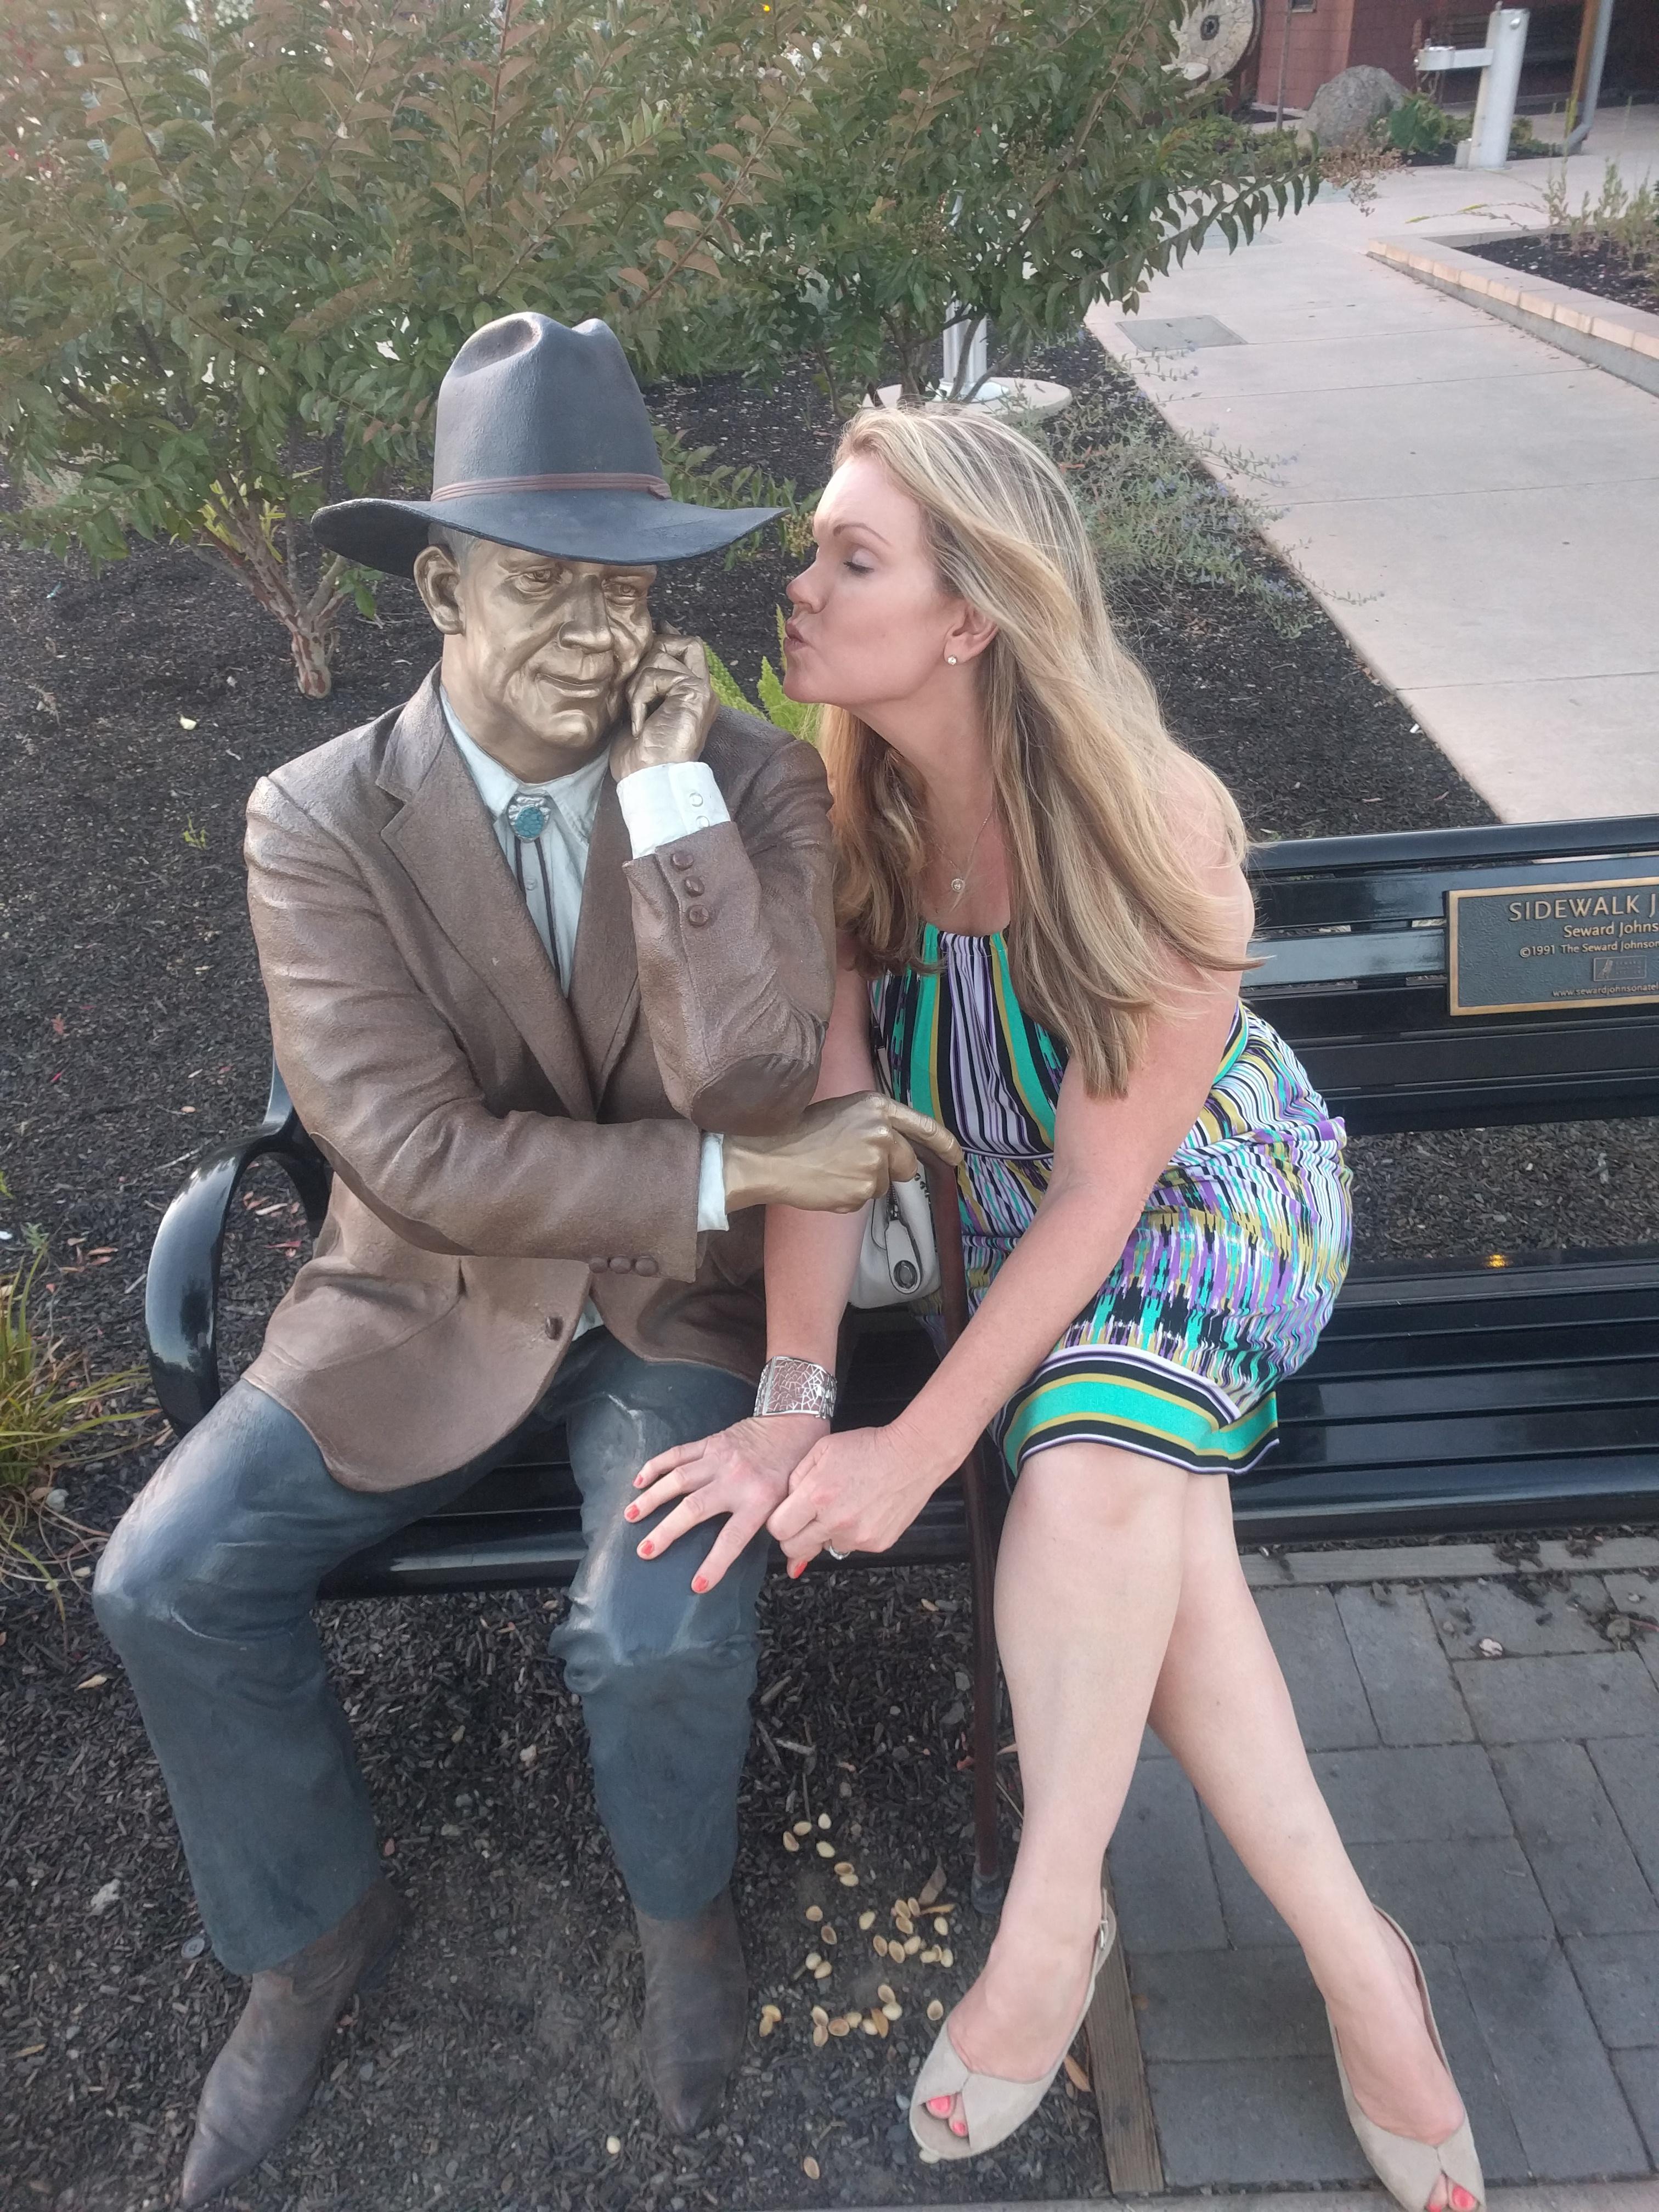 calistoga_gina_bench_statue_kissing